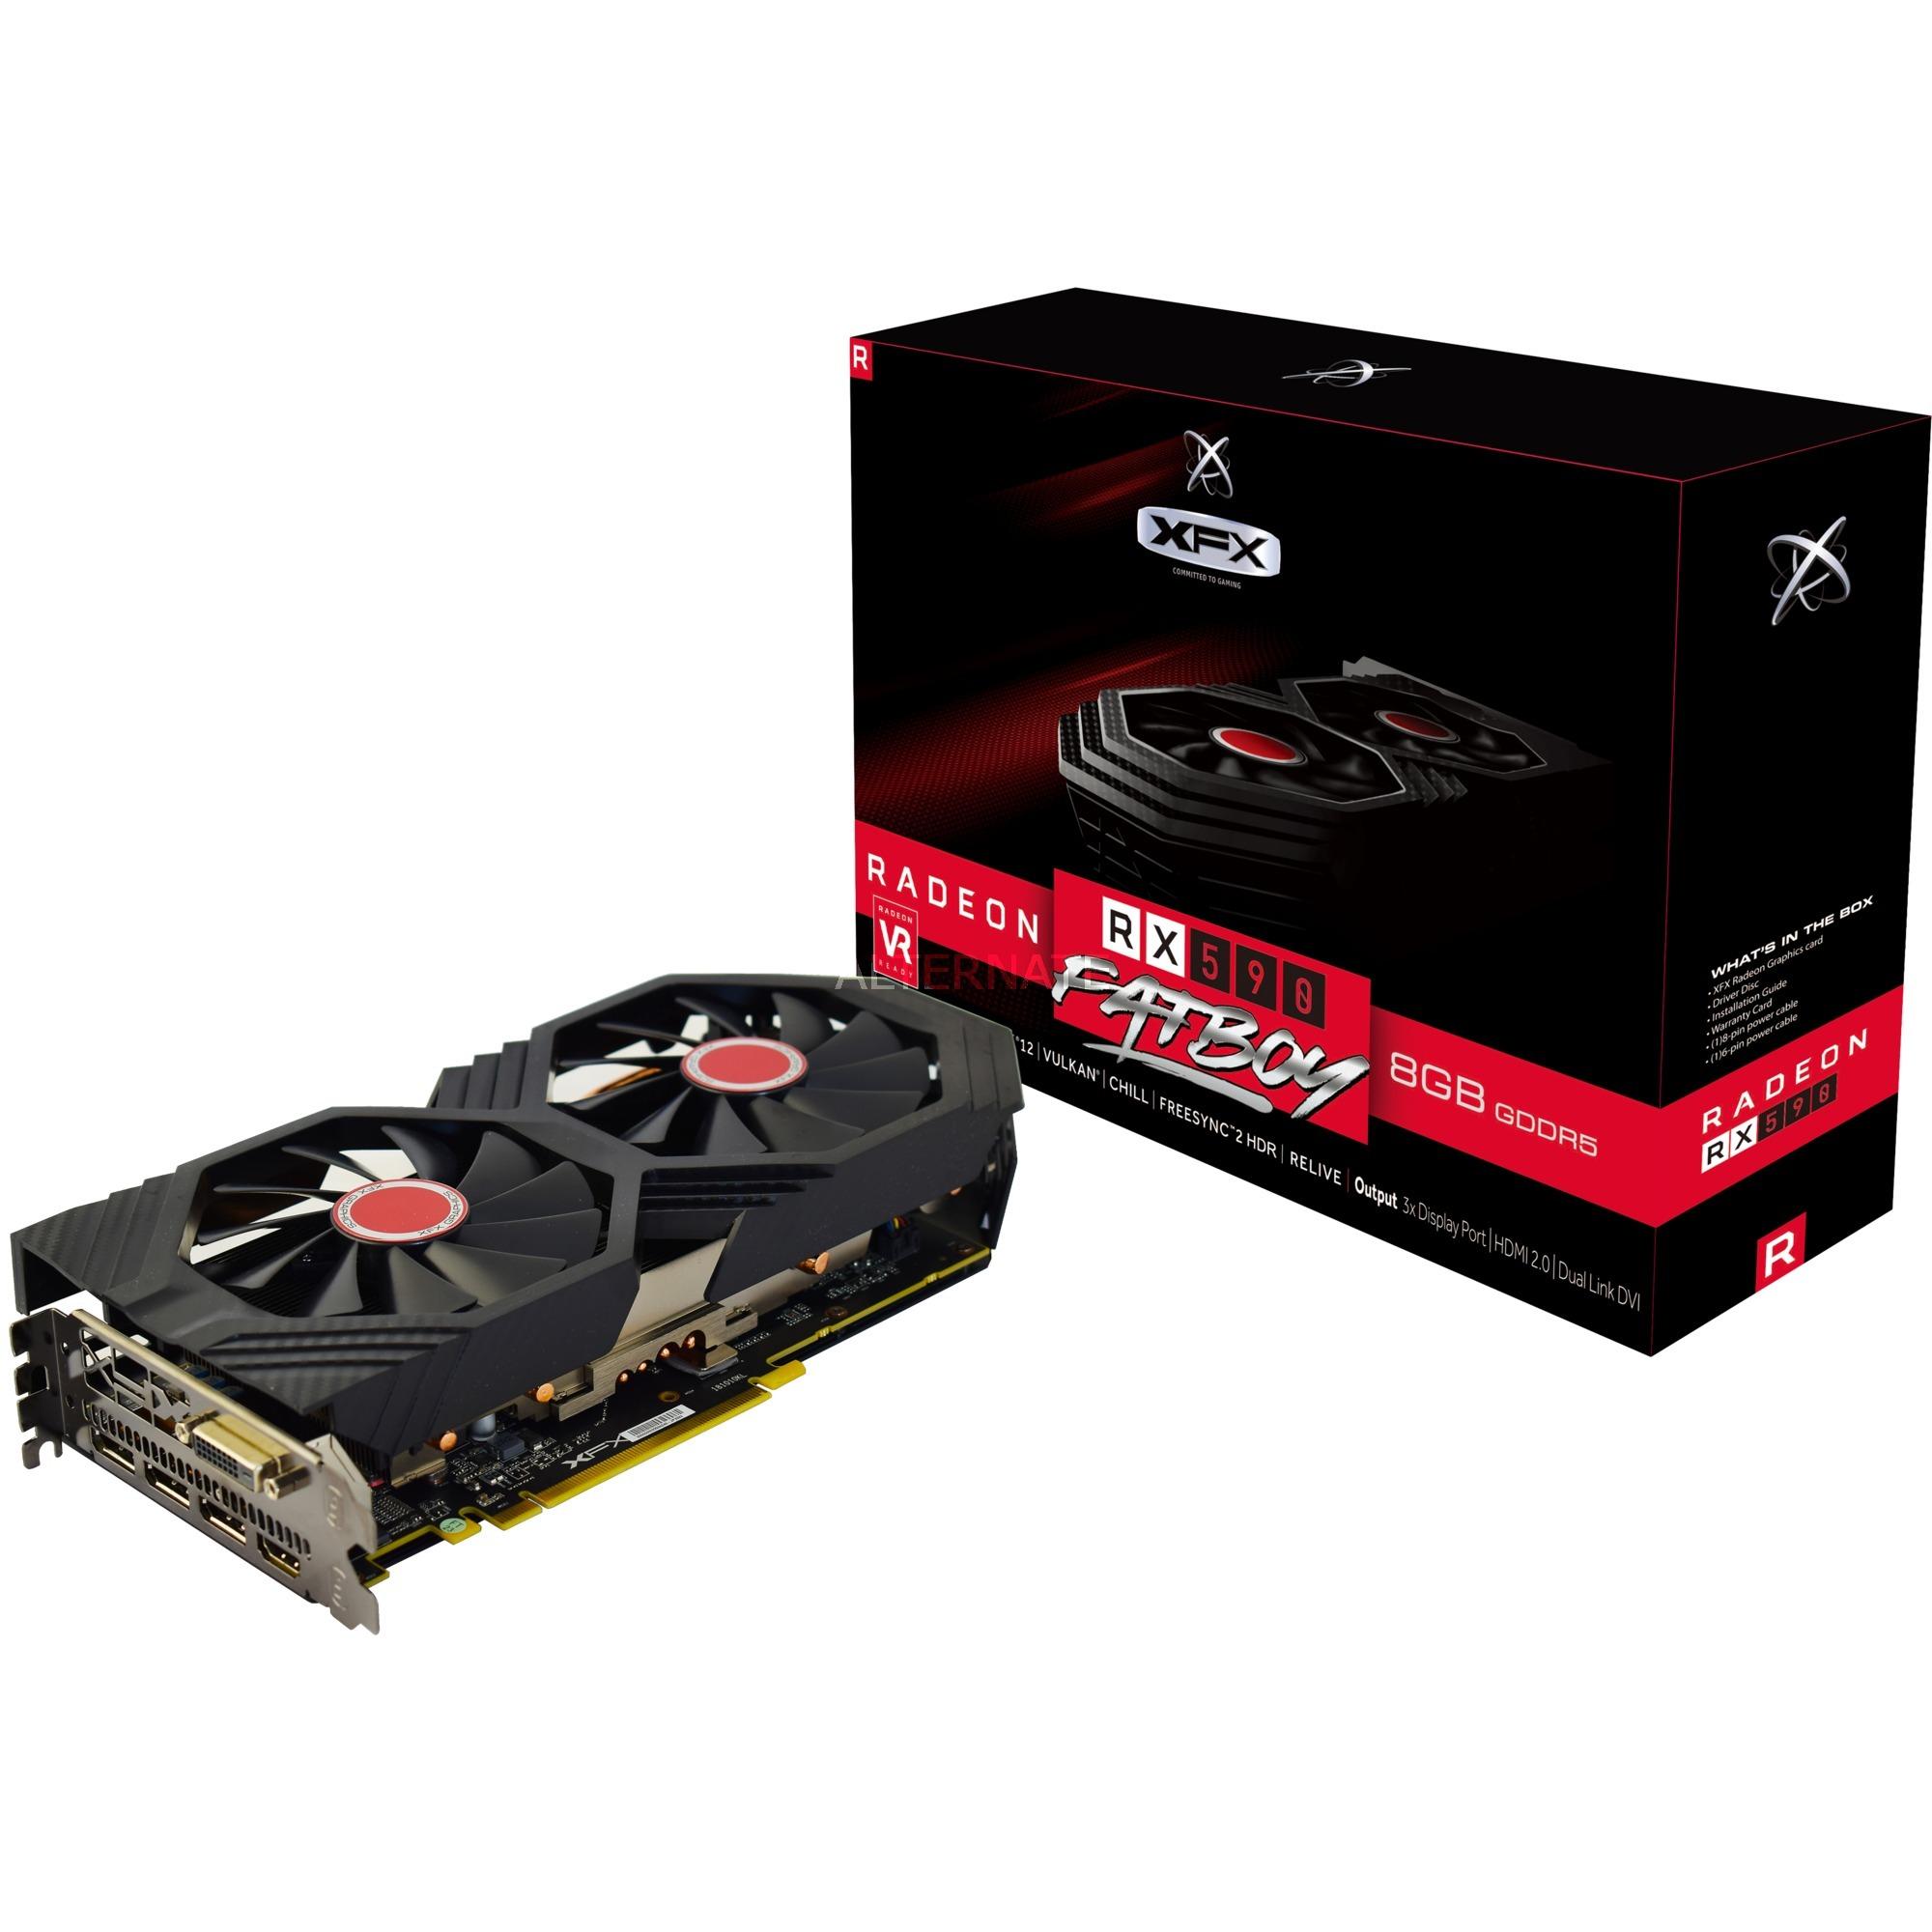 Radeon RX 590 FATBOY, Tarjeta gráfica